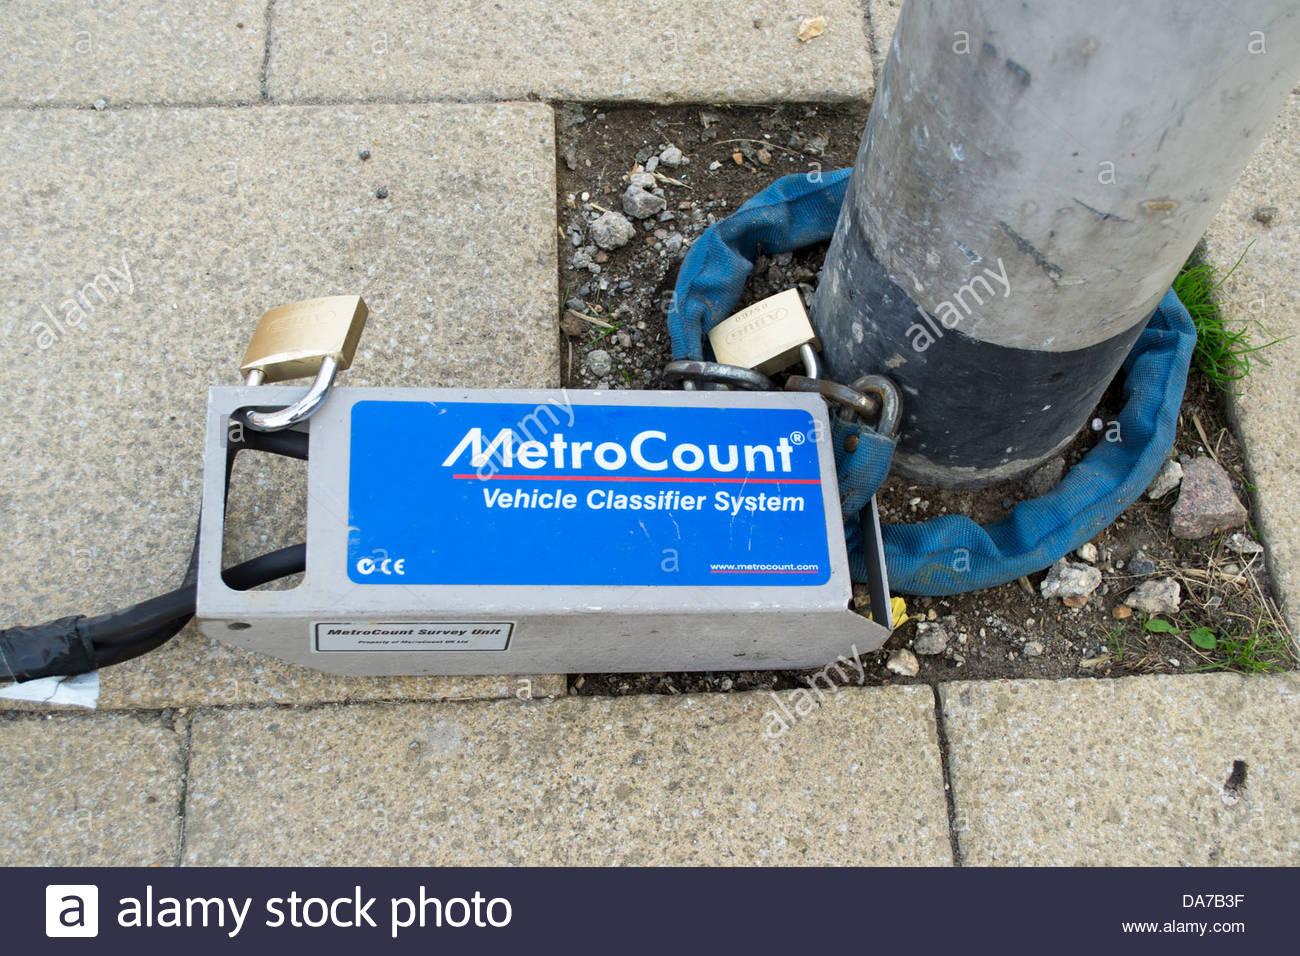 Metrocount portable Fahrzeug Überwachungssystem in Godmanchester installiert. Stockbild